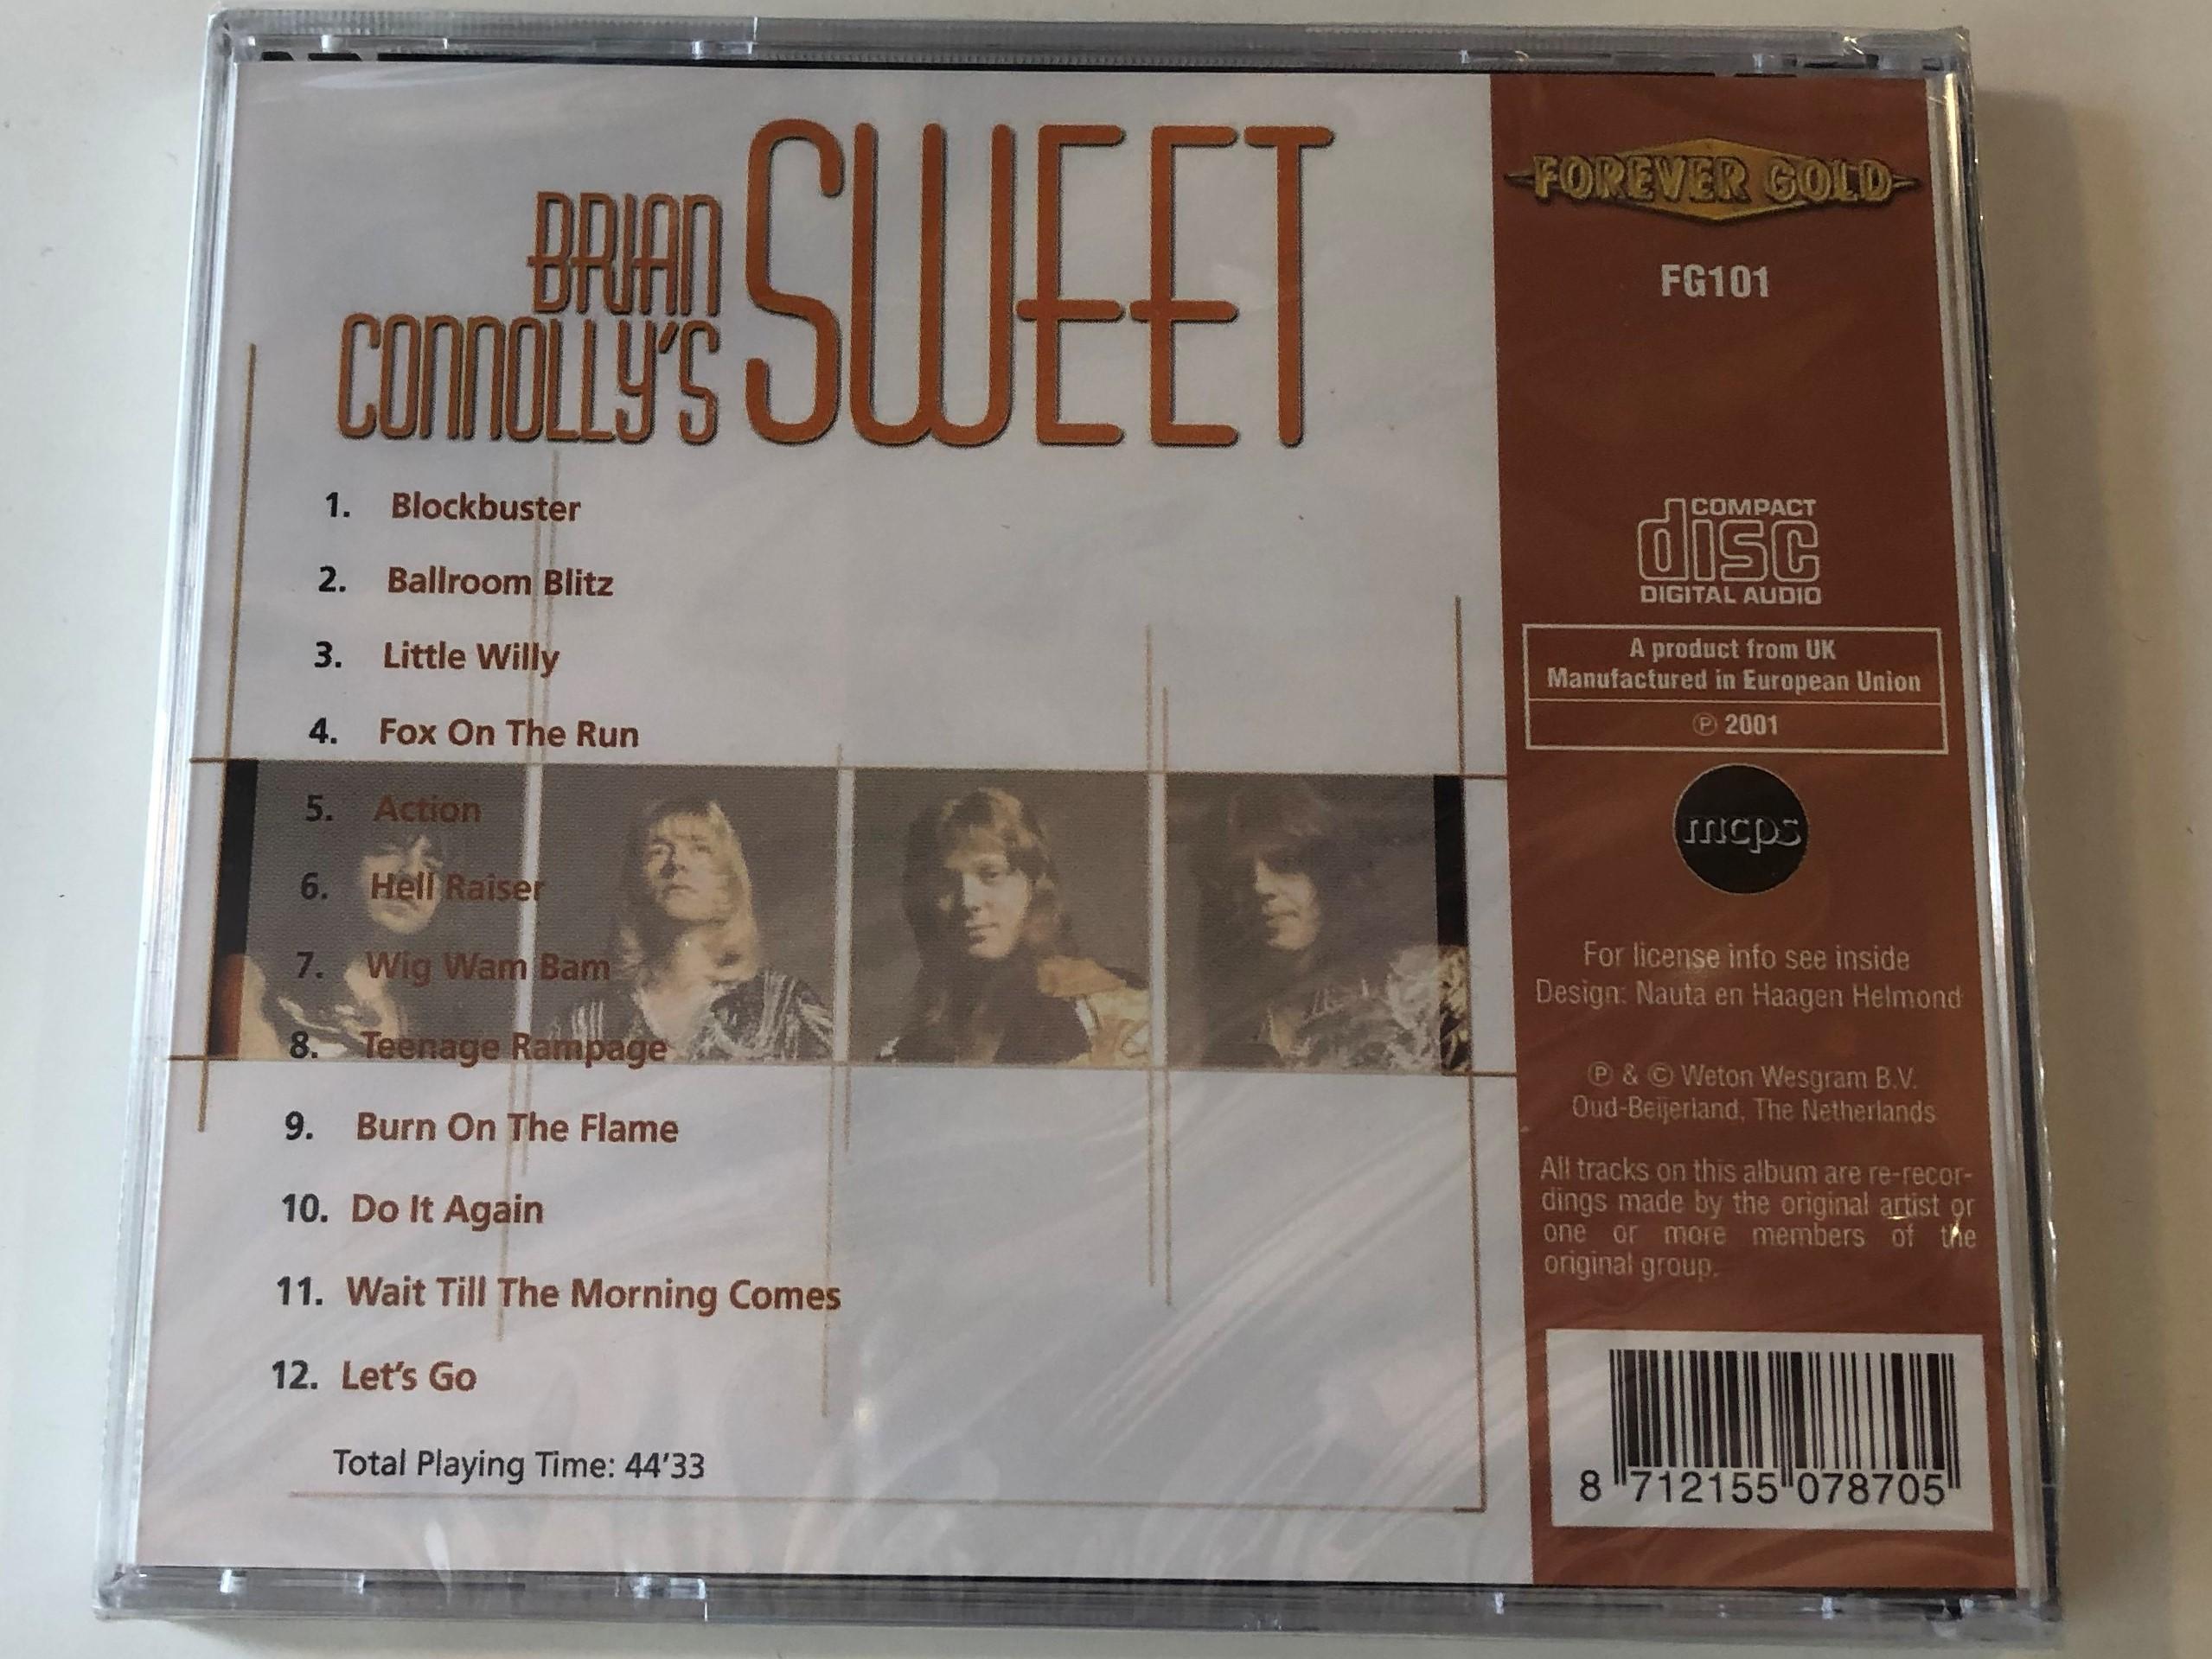 brian-connolly-s-sweet-blockbuster-ballroom-blitz-fox-on-the-run-wig-wam-bam-forever-gold-audio-cd-2001-fg101-2-.jpg